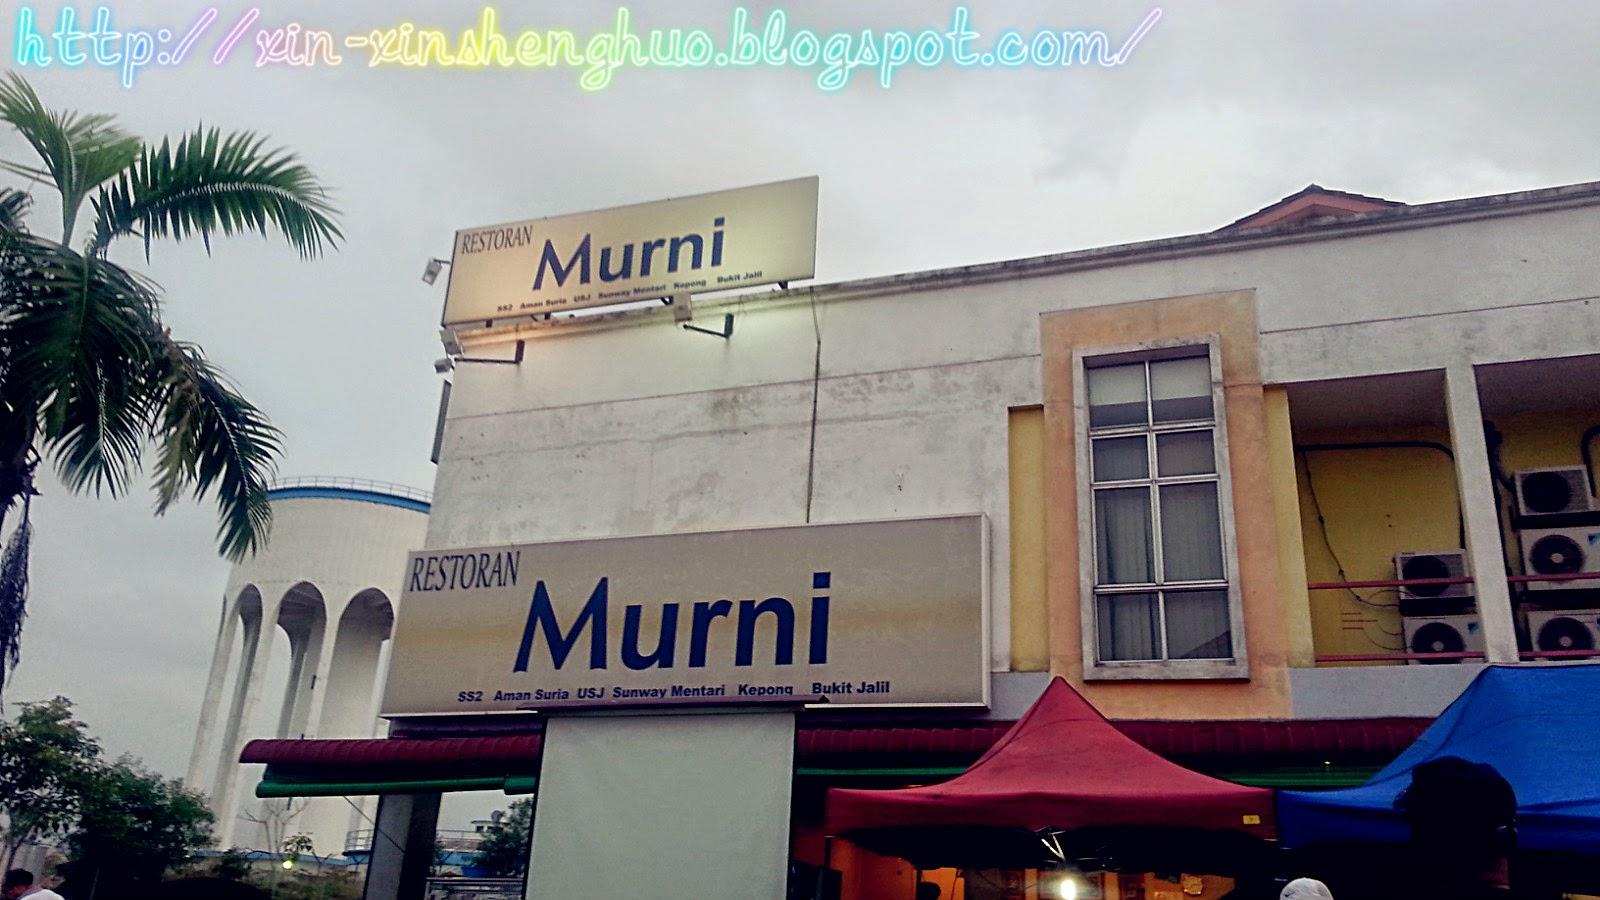 Restoran Murni